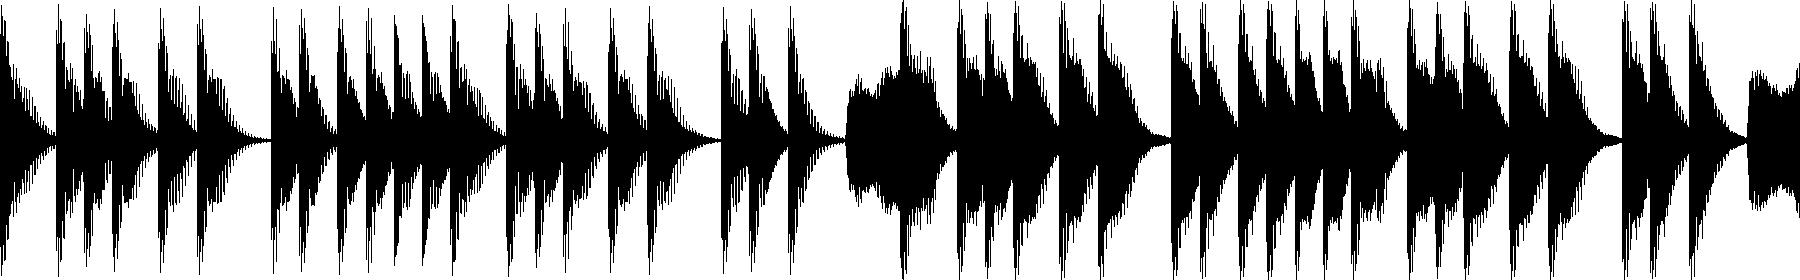 vedh melodyloop 082 f d 126bpm